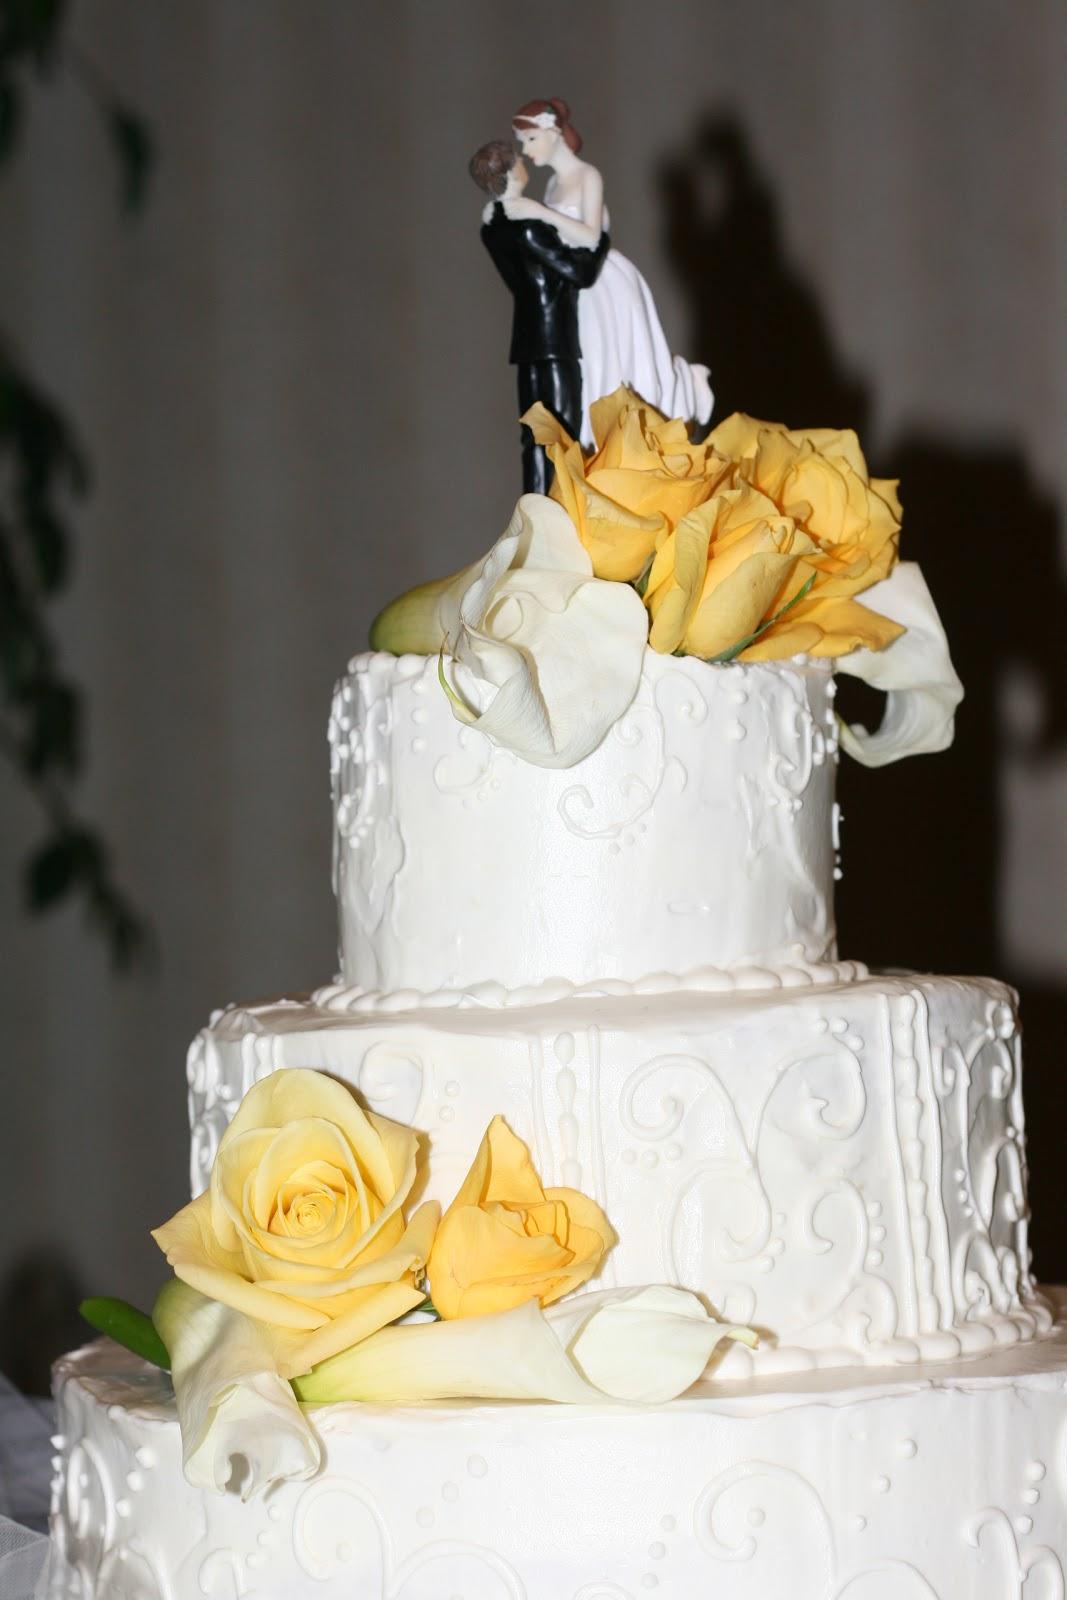 Cakes By Kim: A beatiful wedding cake in Yellow